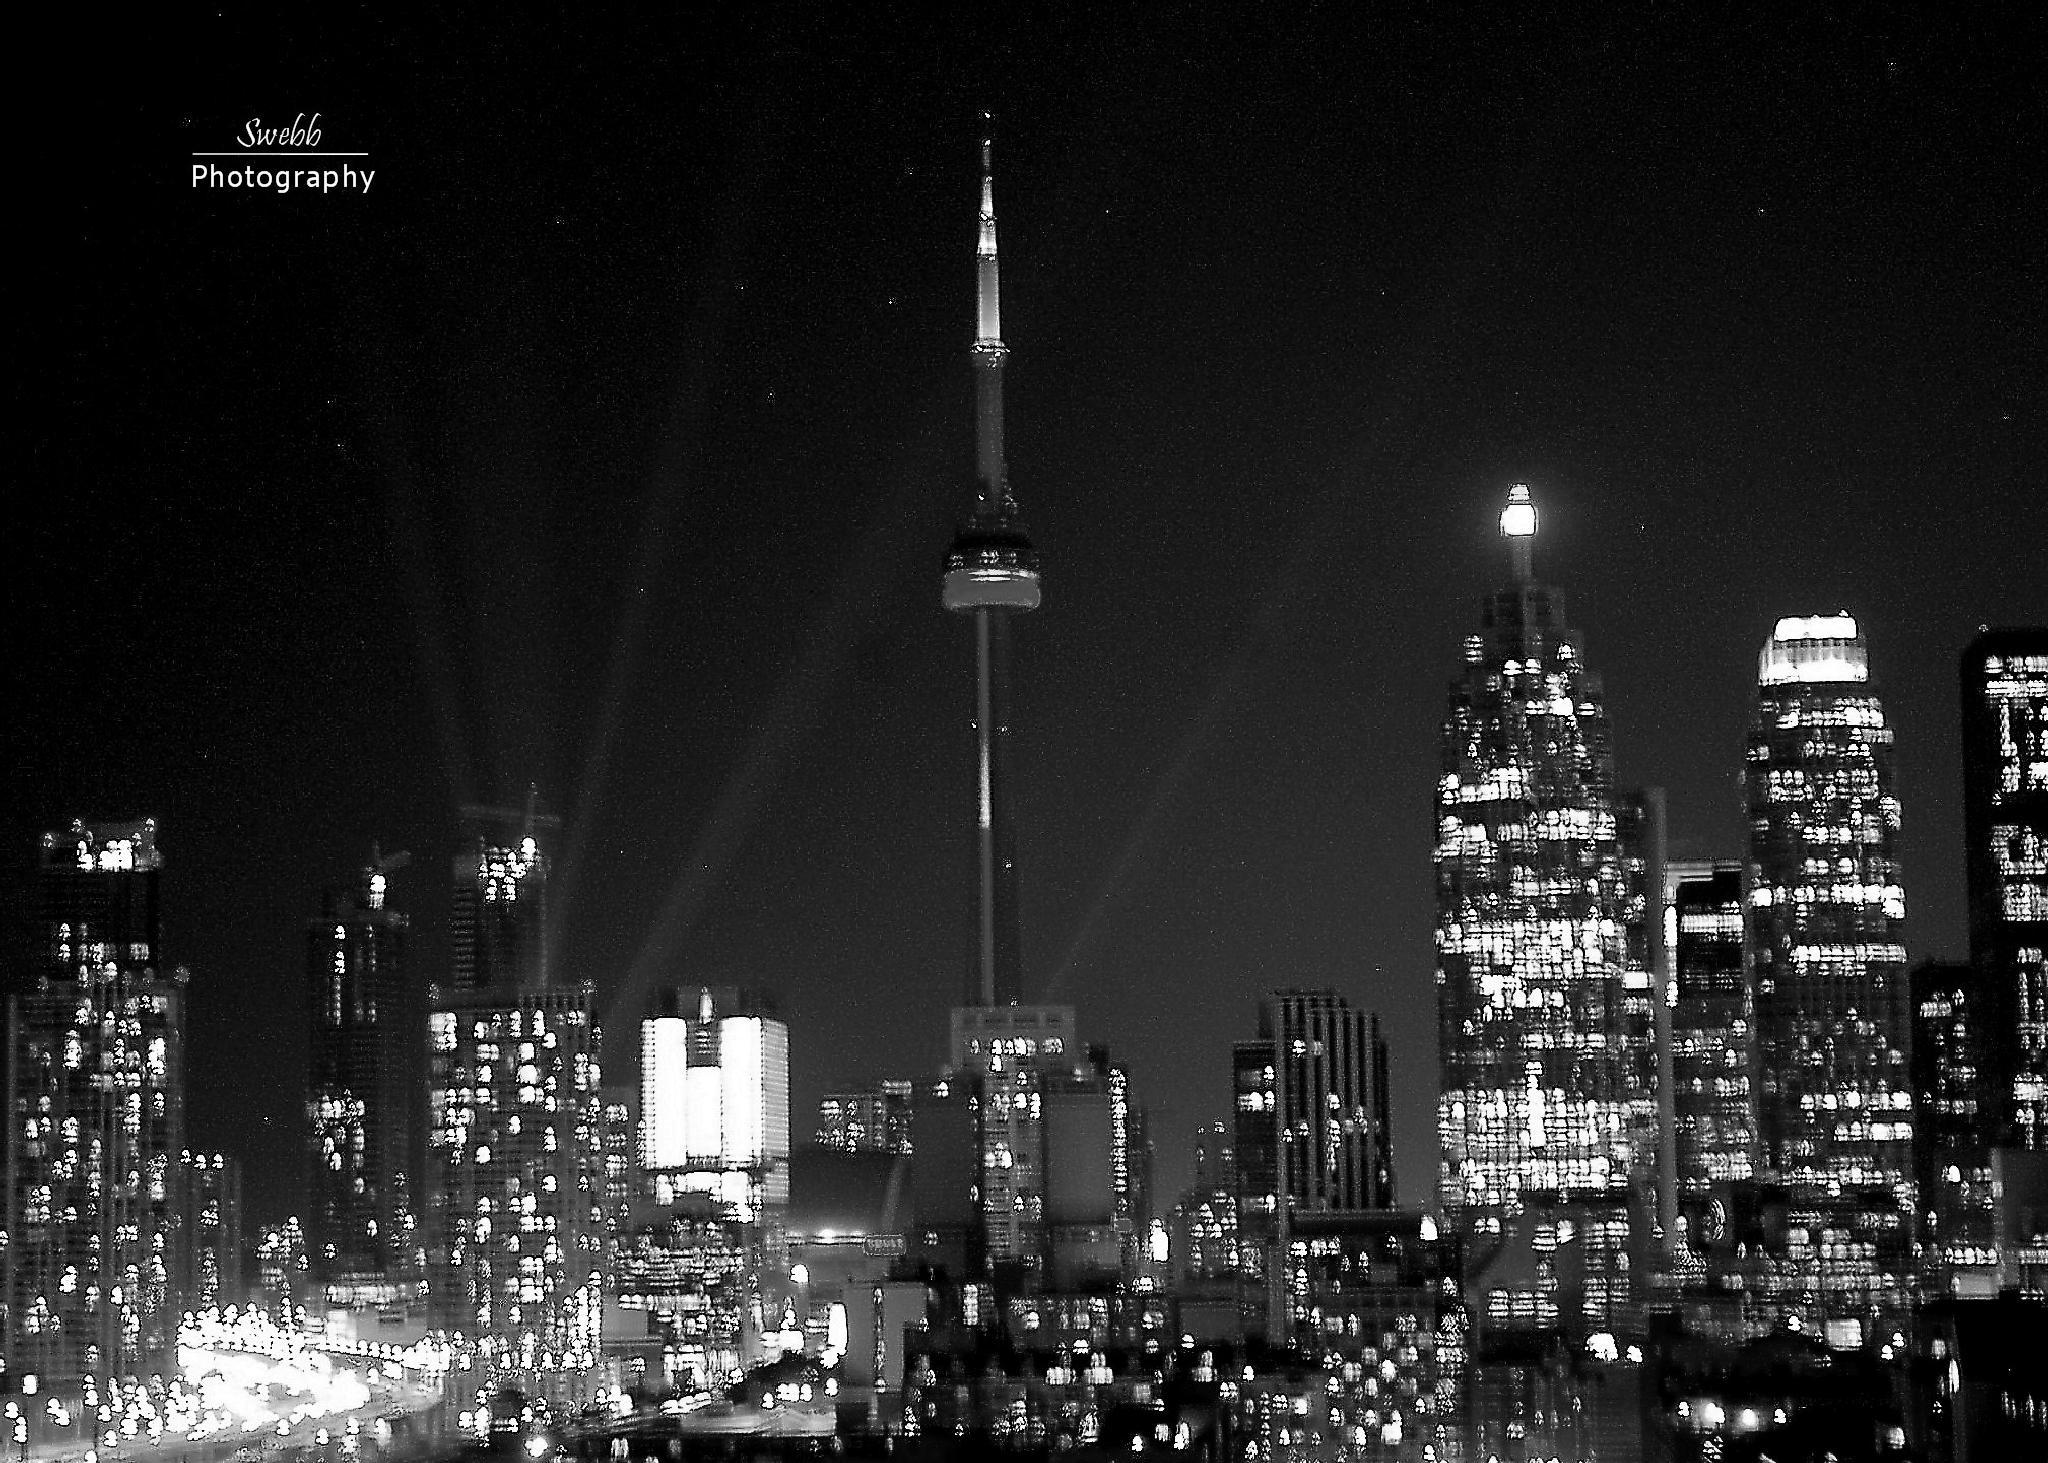 Toronto At Night by Steve Webb